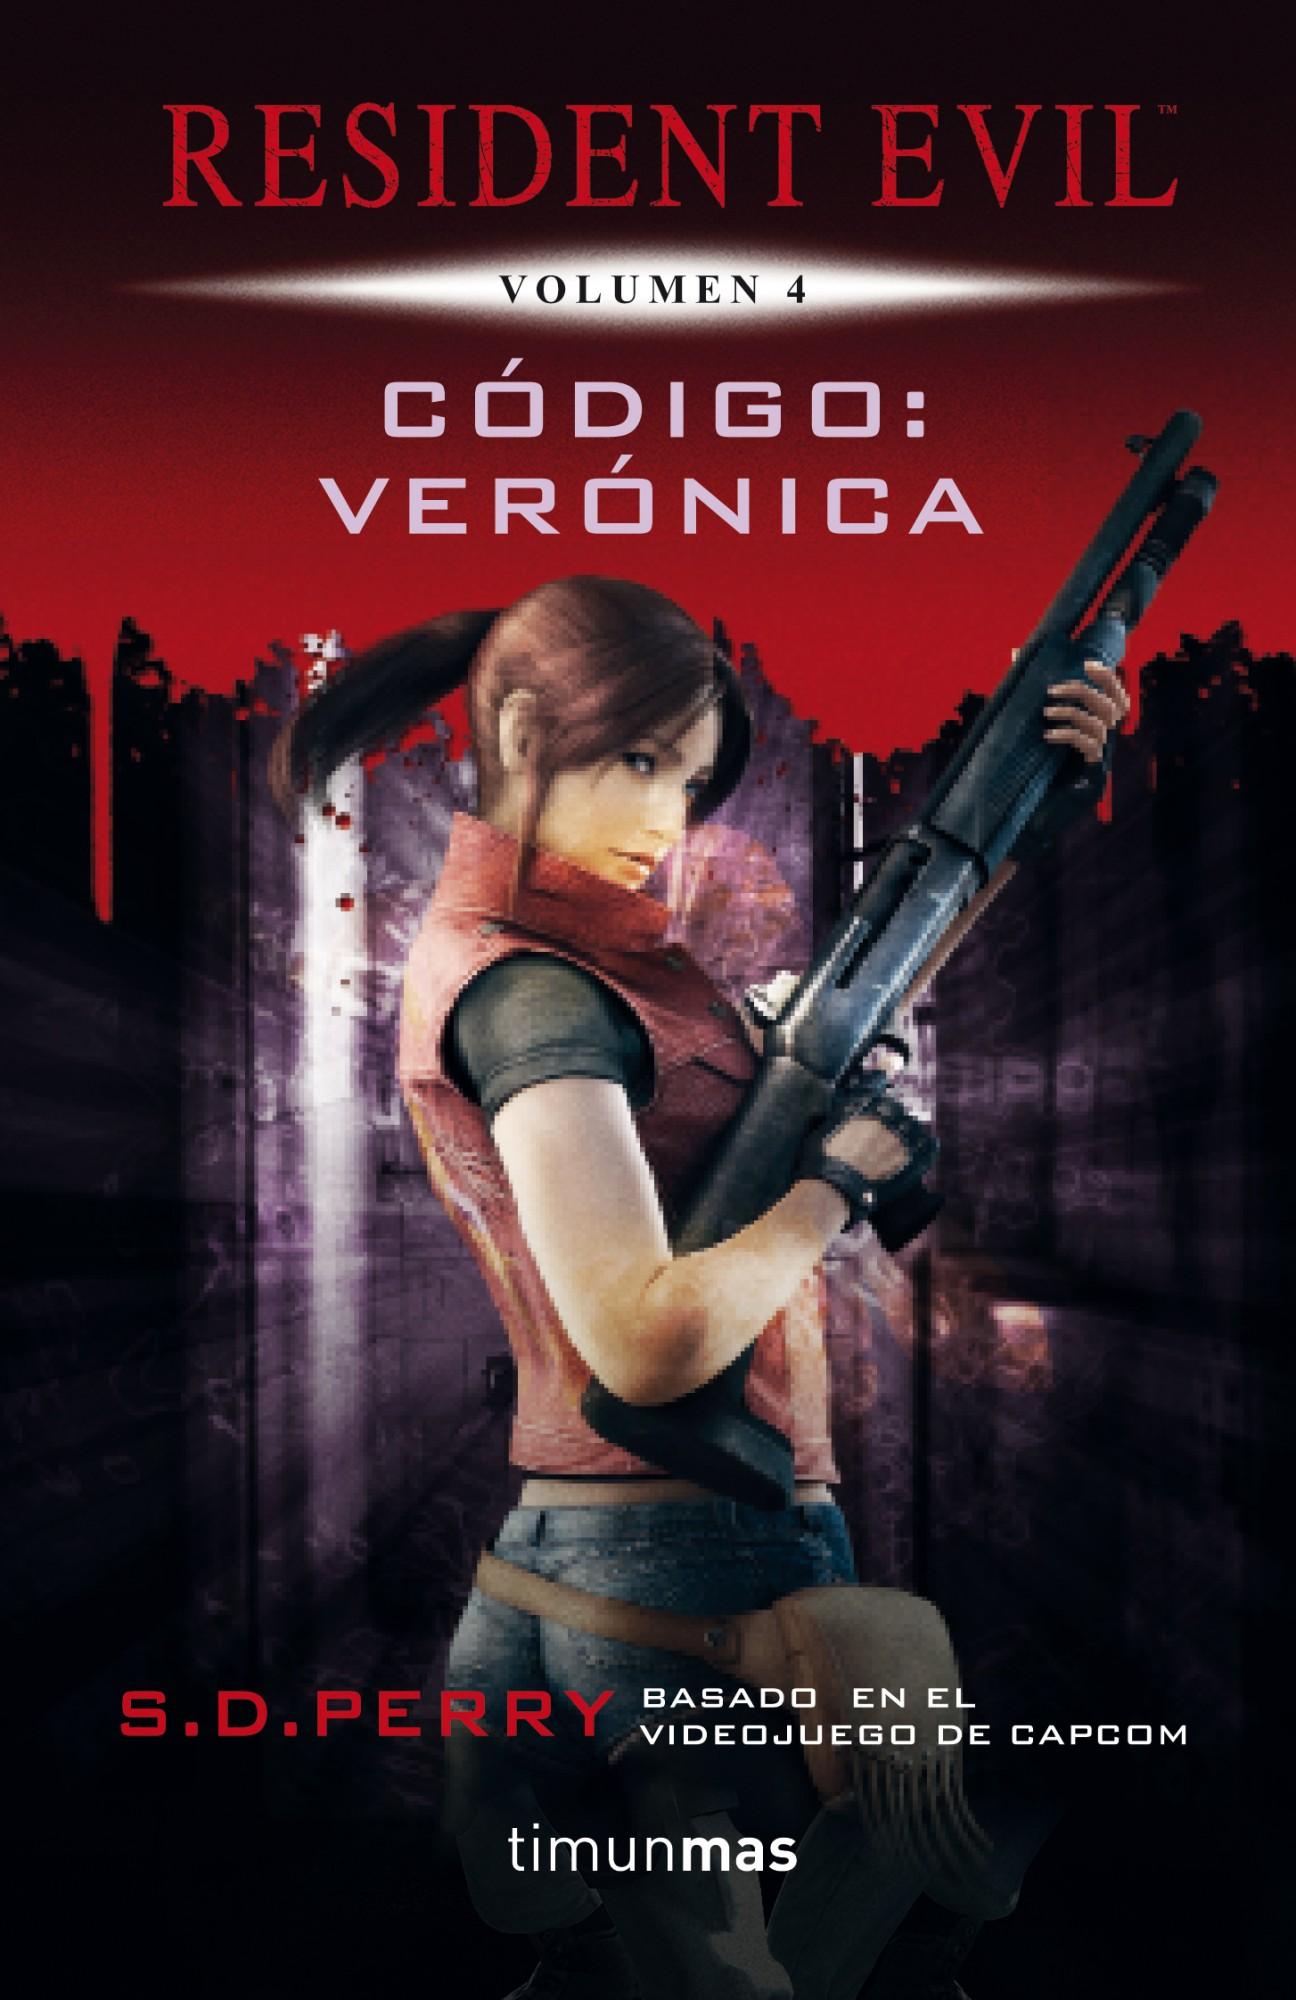 Descargar RESIDENT EVIL VOLUMEN 4  CODIGO: VERONICA